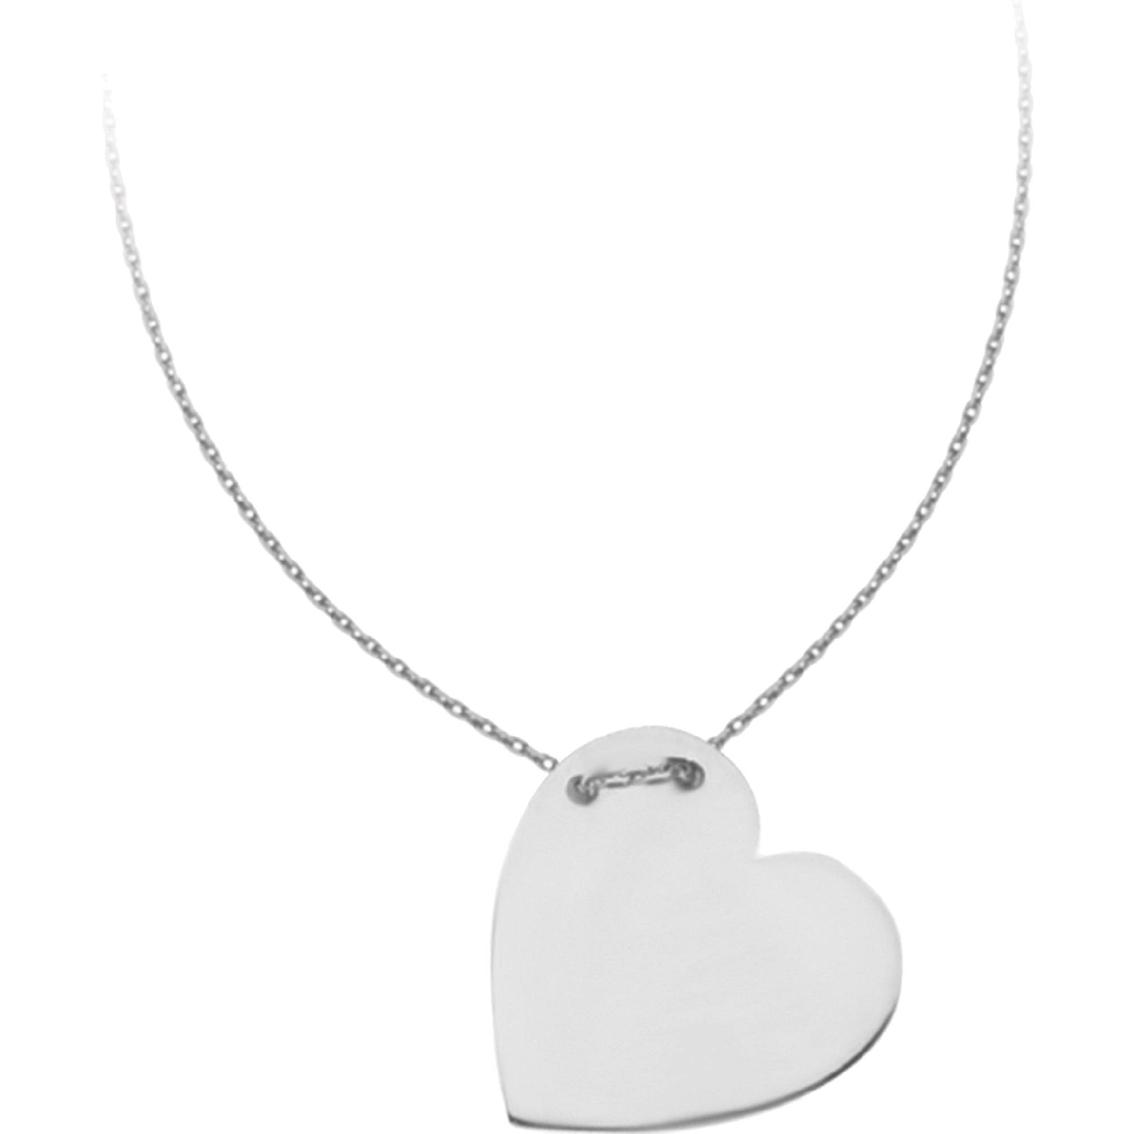 14k white gold heart name plate necklace gold necklaces. Black Bedroom Furniture Sets. Home Design Ideas